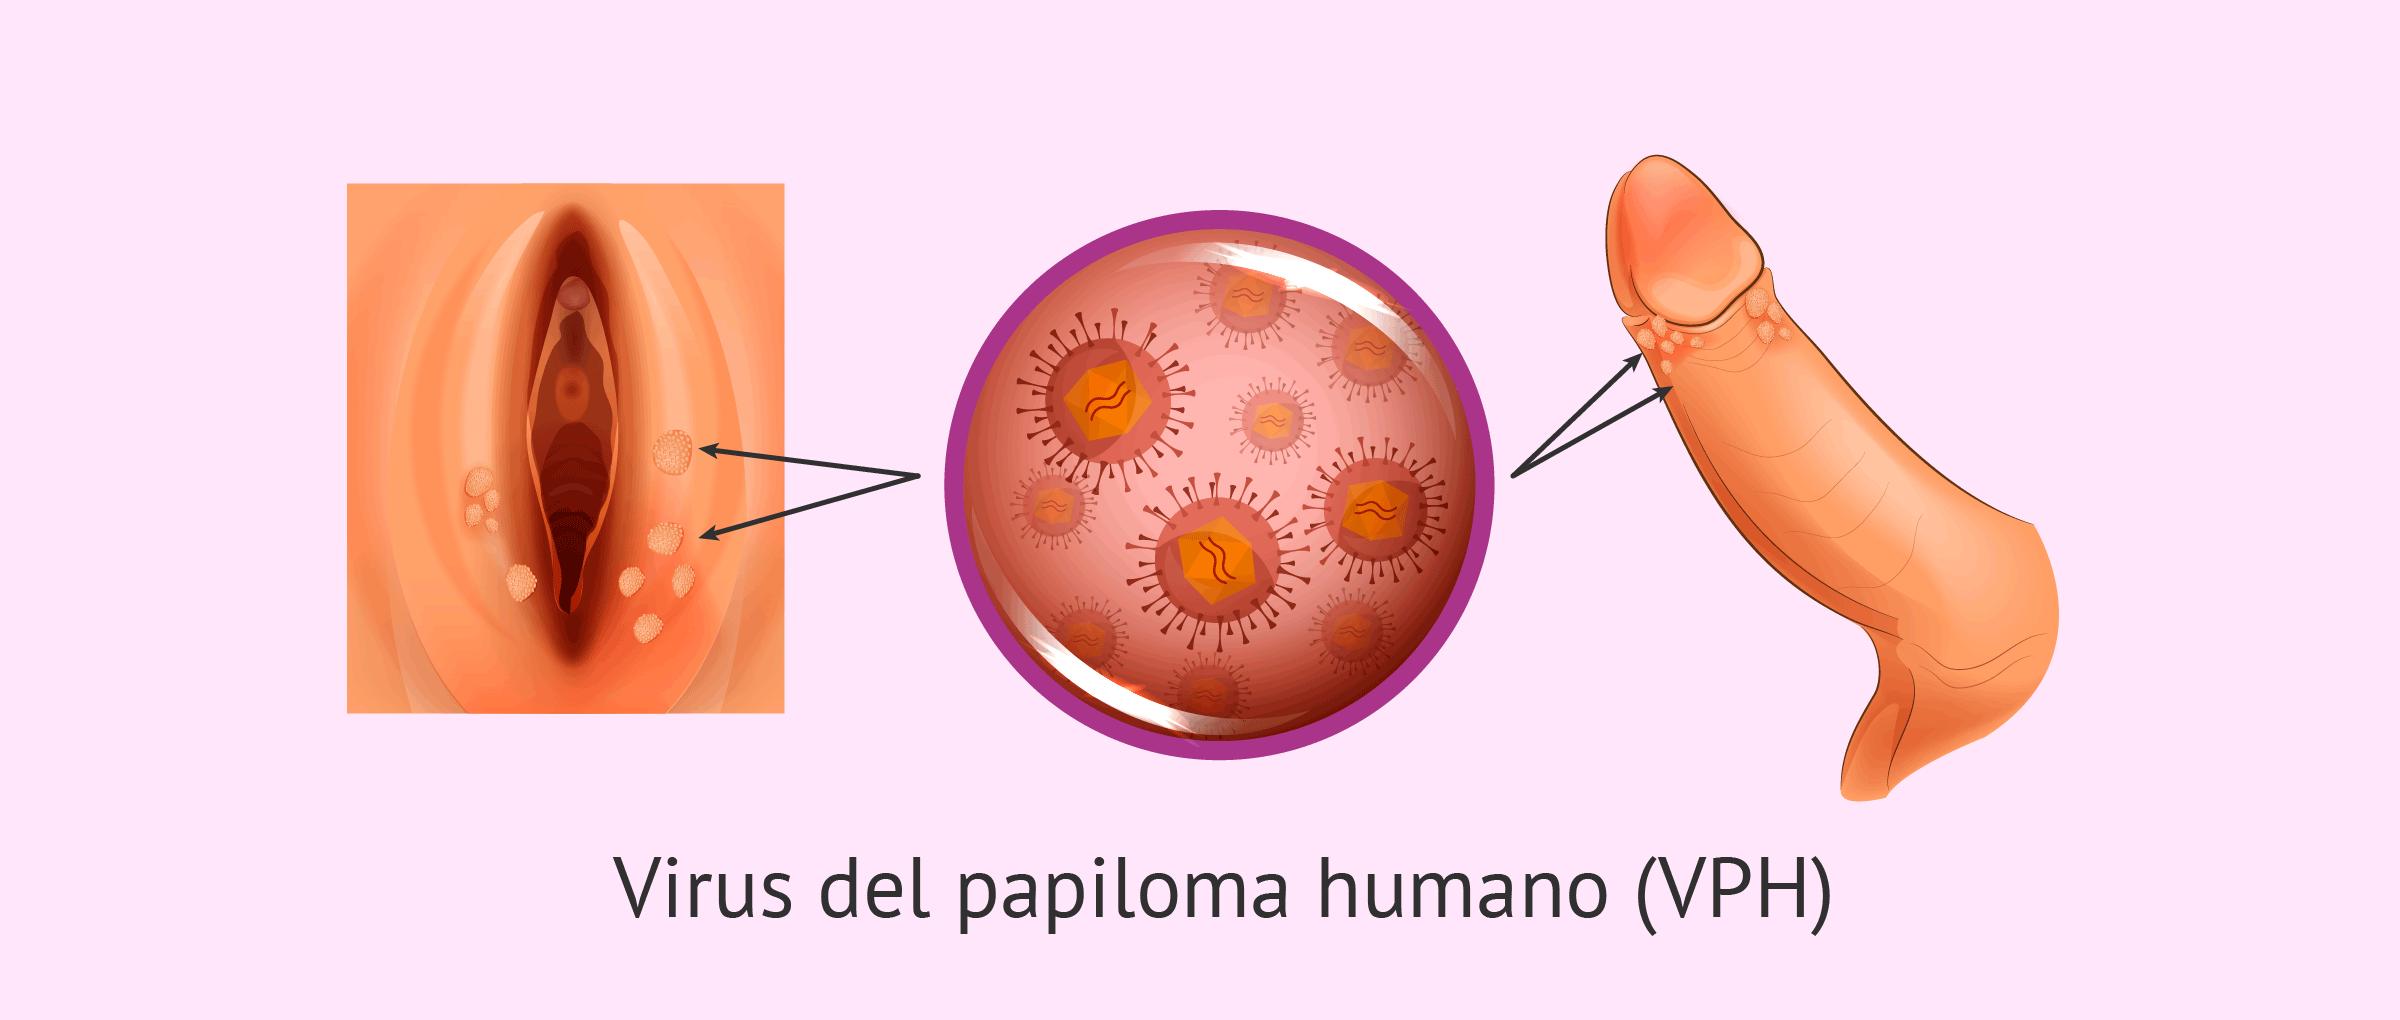 imagenes del virus papiloma humano en mujeres